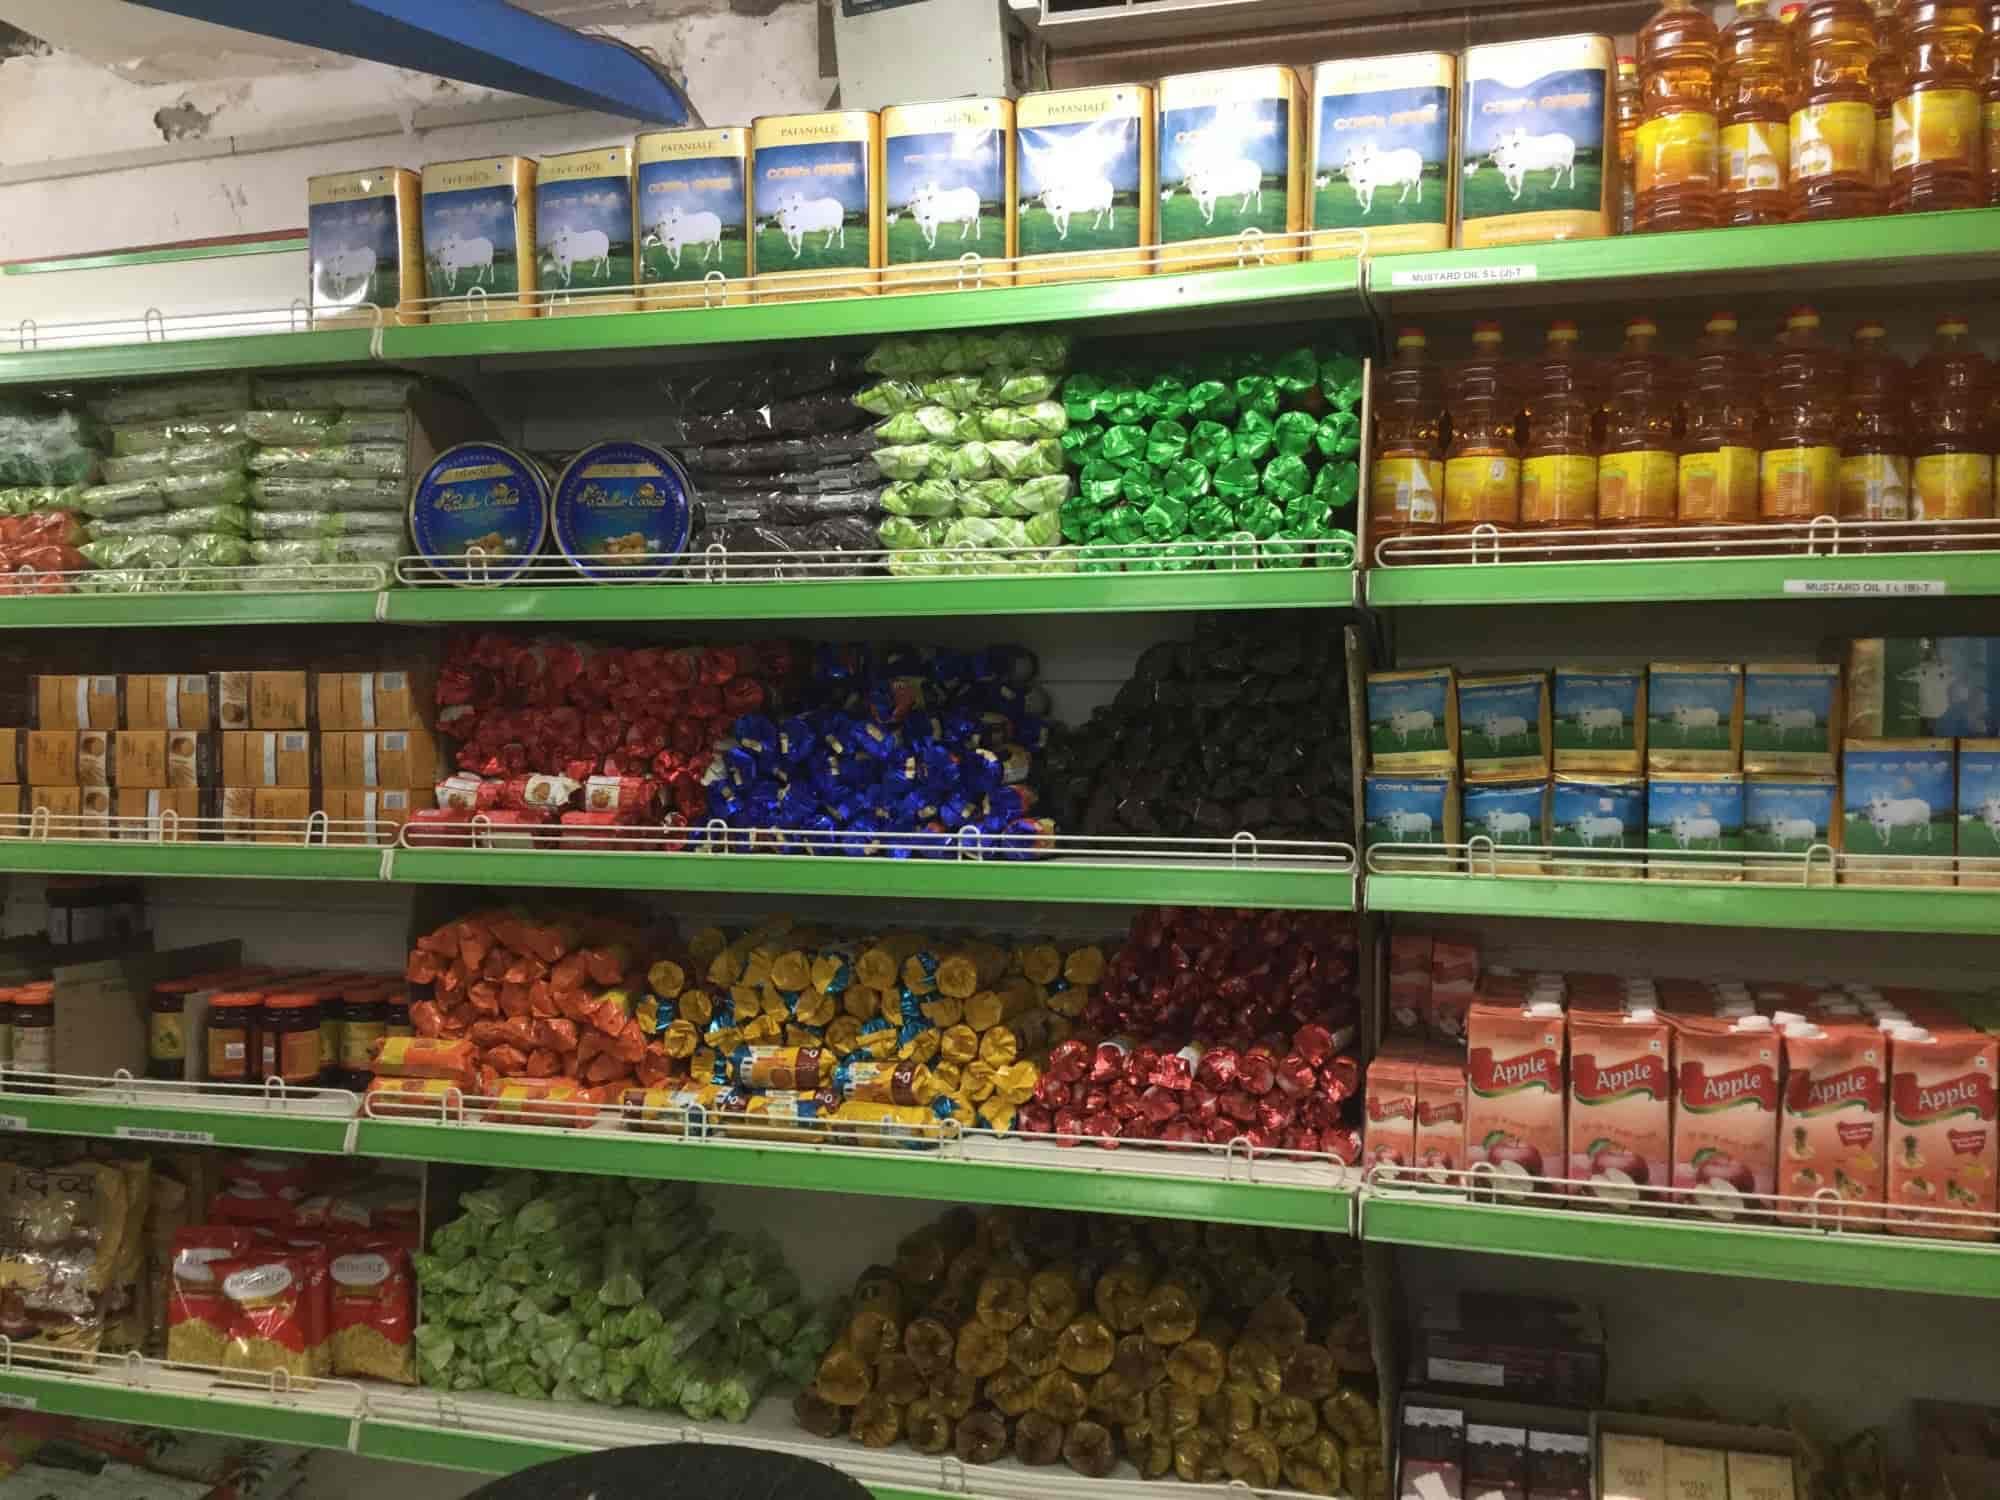 Patanjali Chikitsalaya - Aloe Vera Juice Retailers - Book